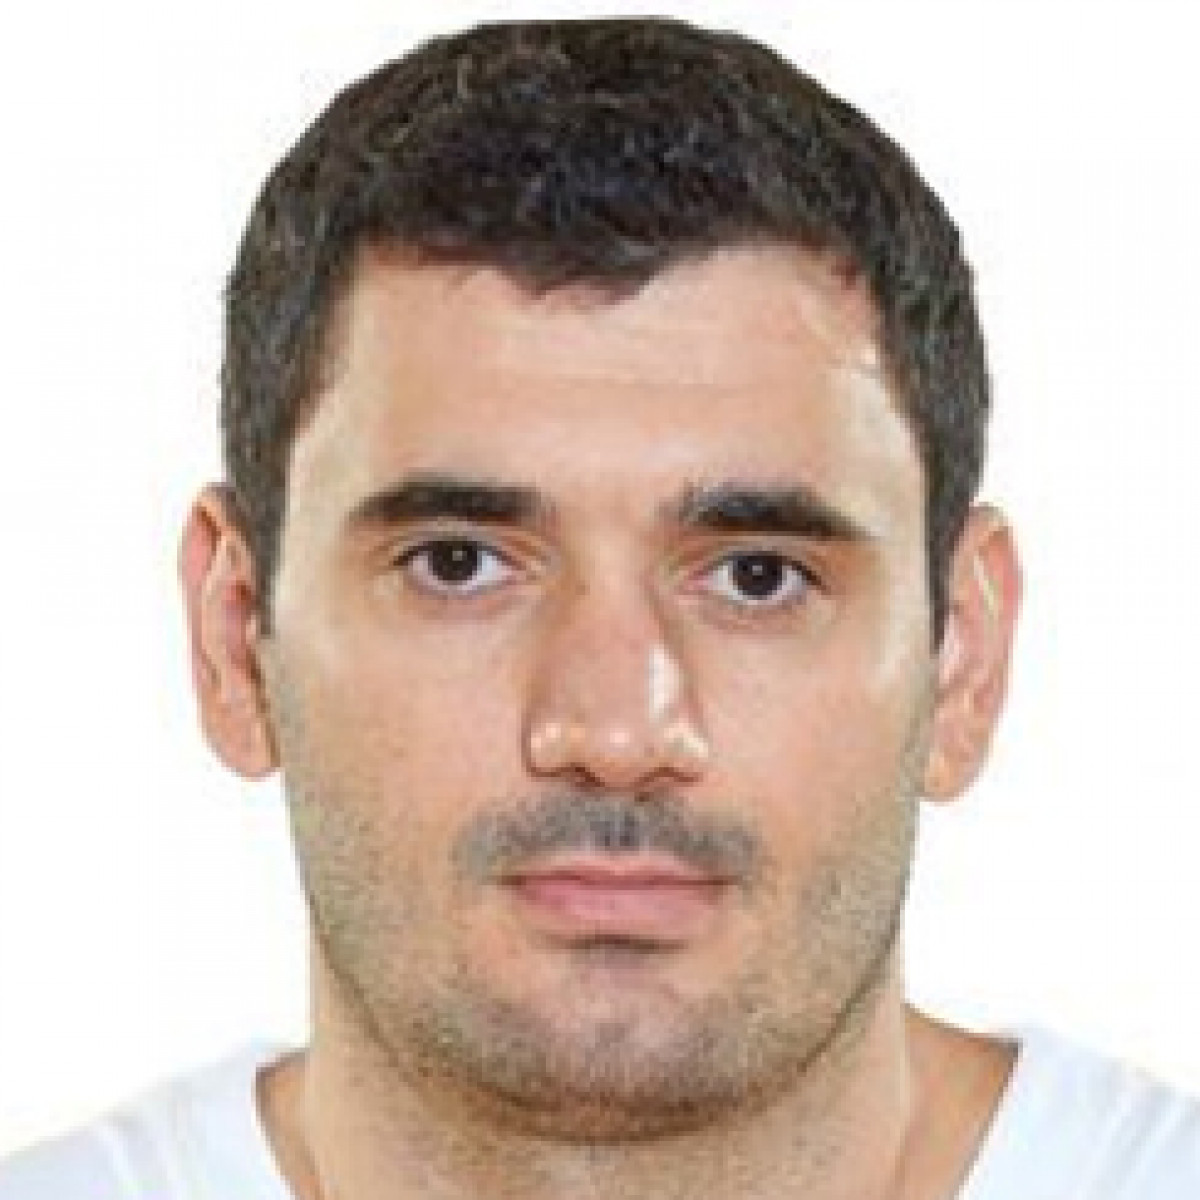 Marko Jagodic